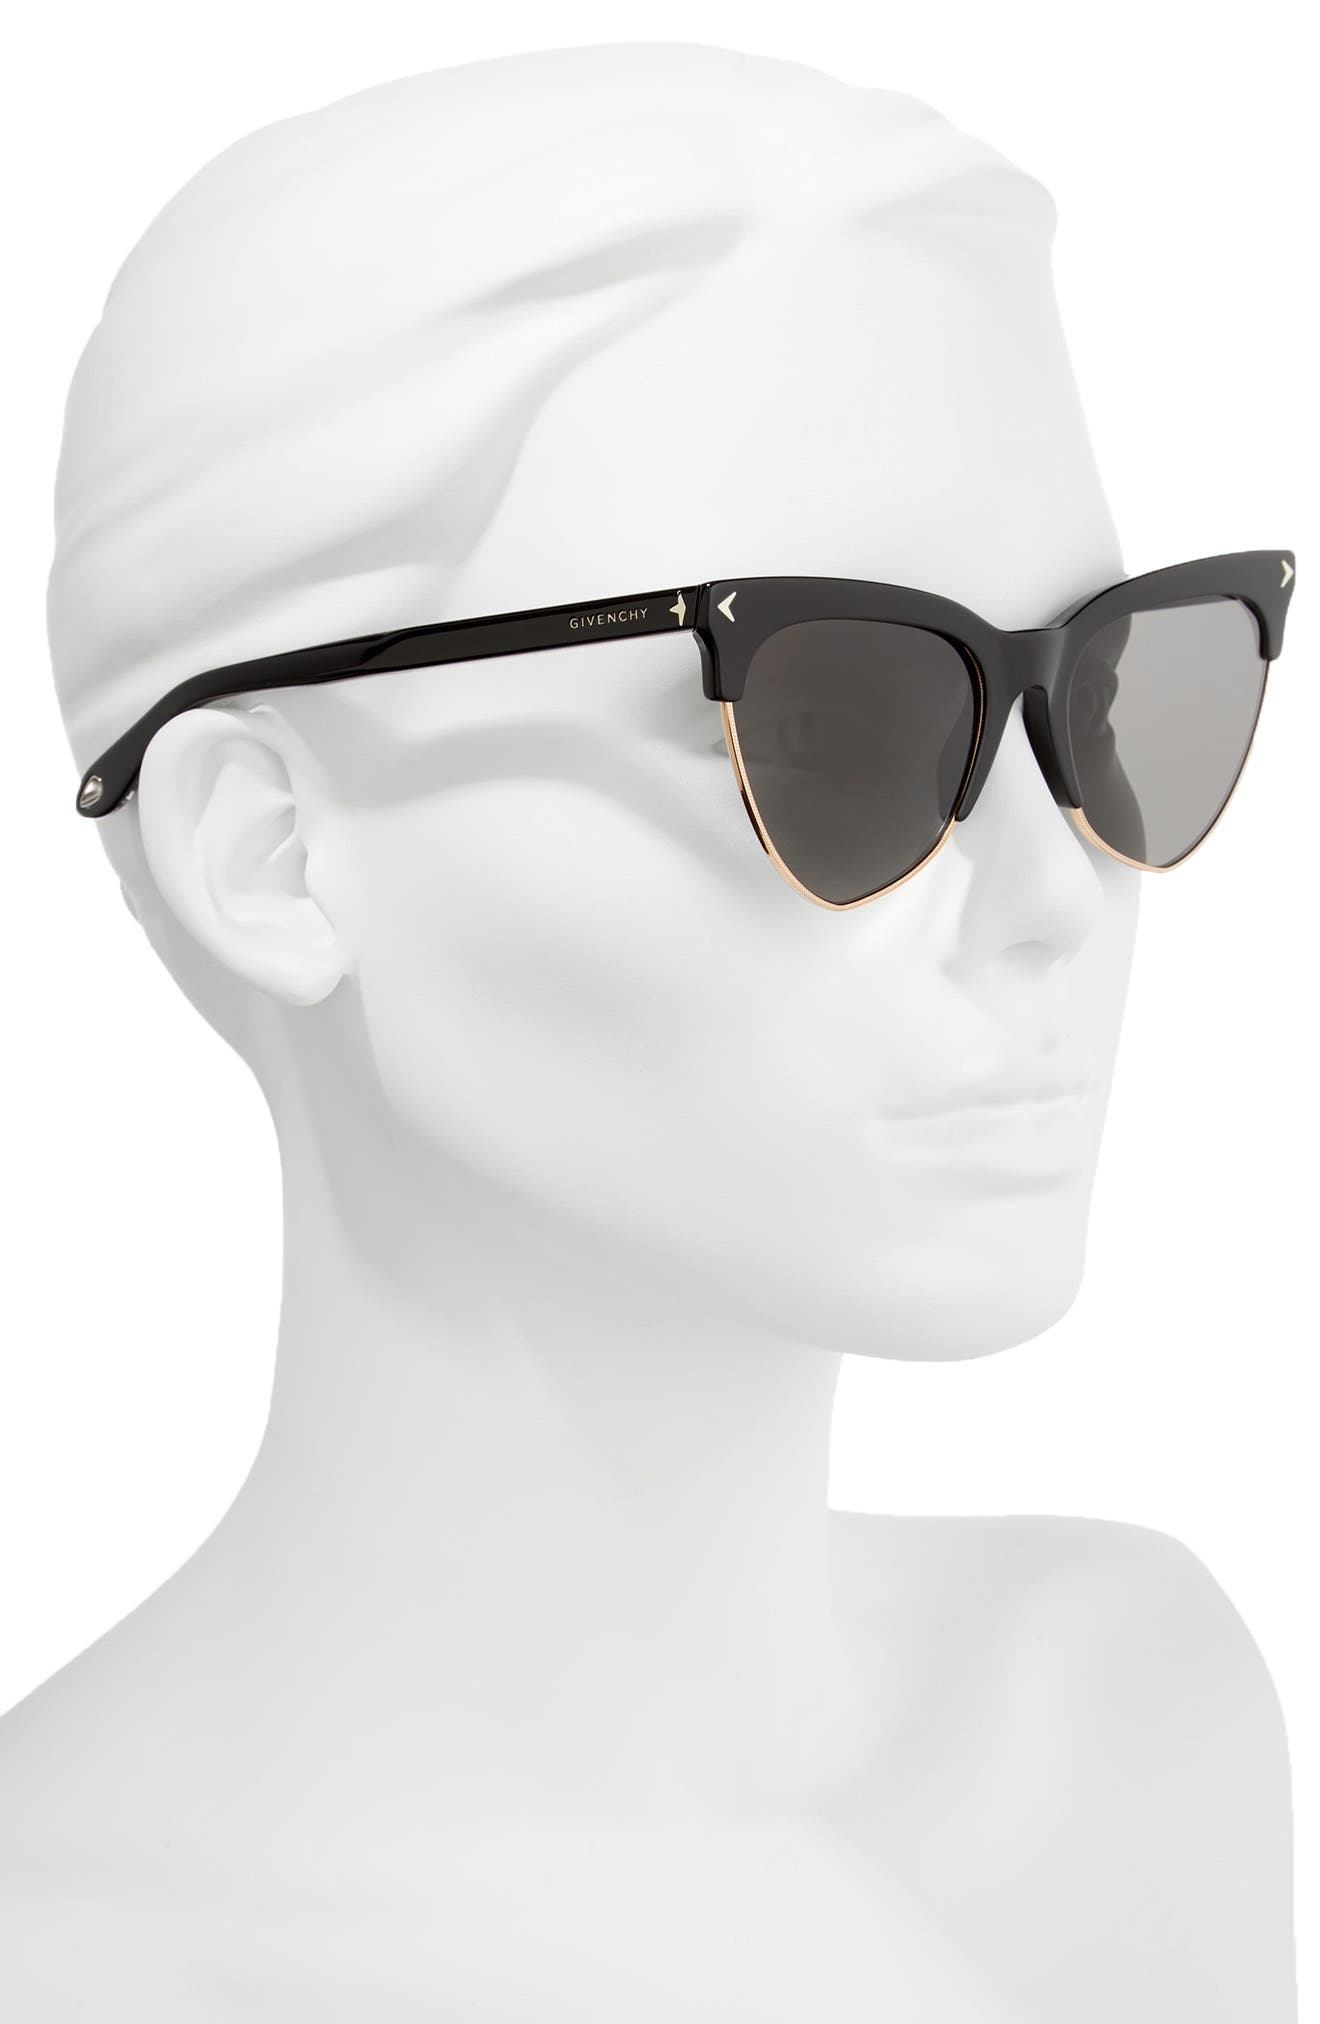 54mm Polarized Cat Eye Sunglasses,                             Alternate thumbnail 2, color,                             001